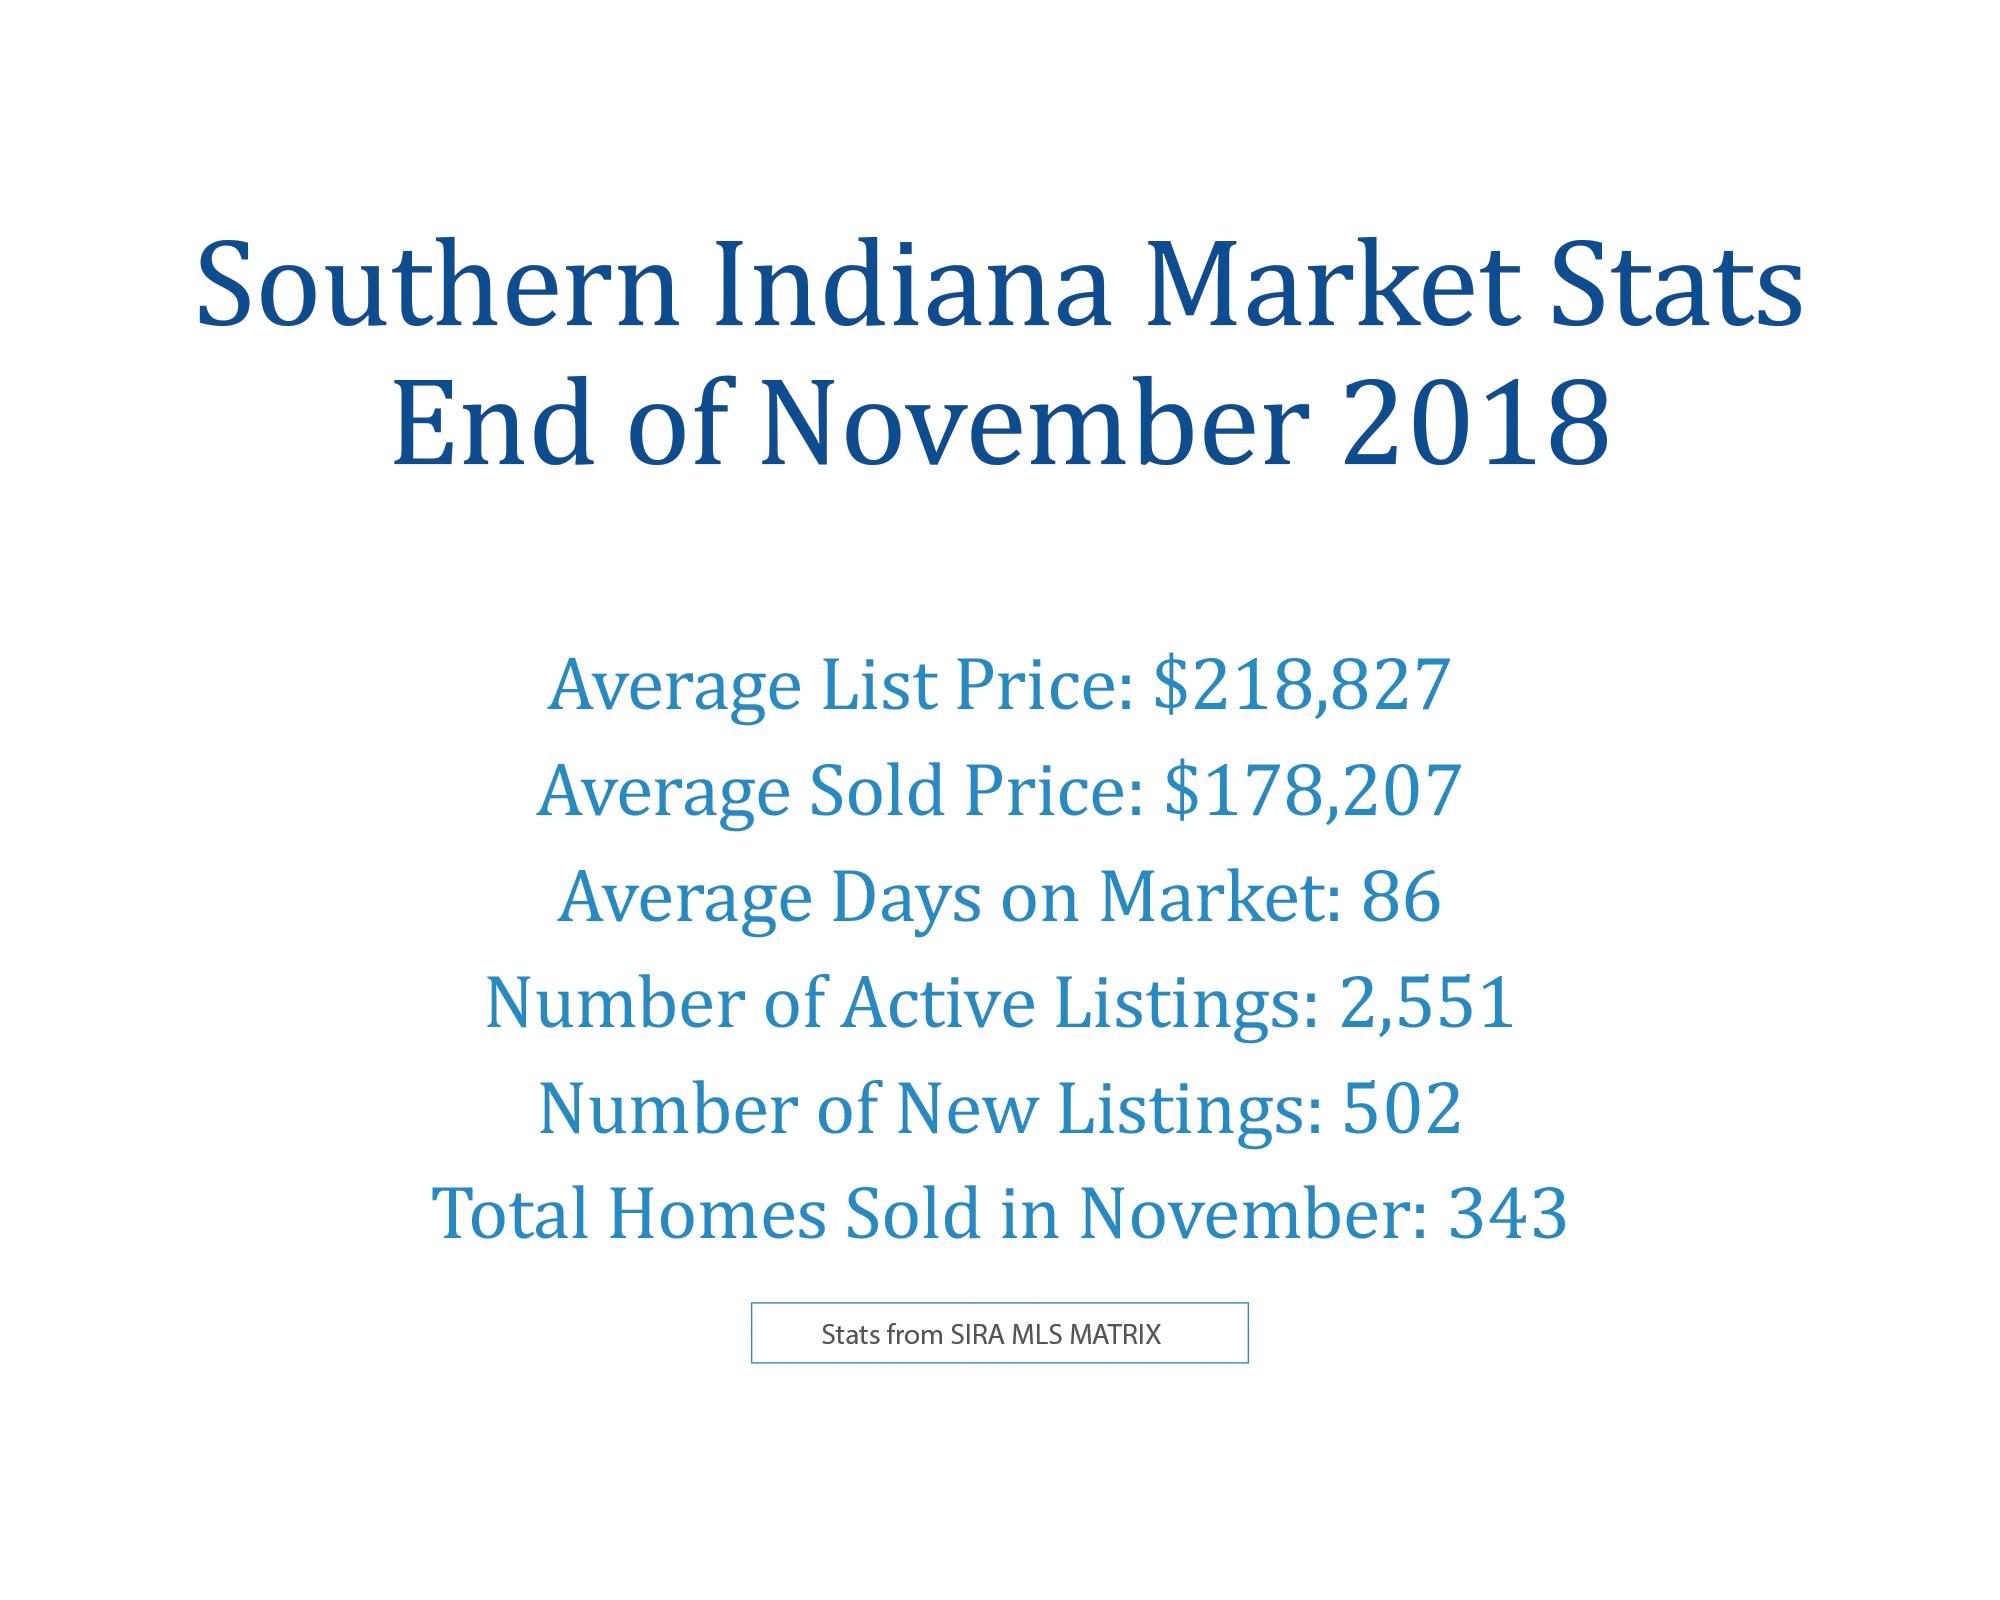 November 2018 Southern Indiana Real Estate